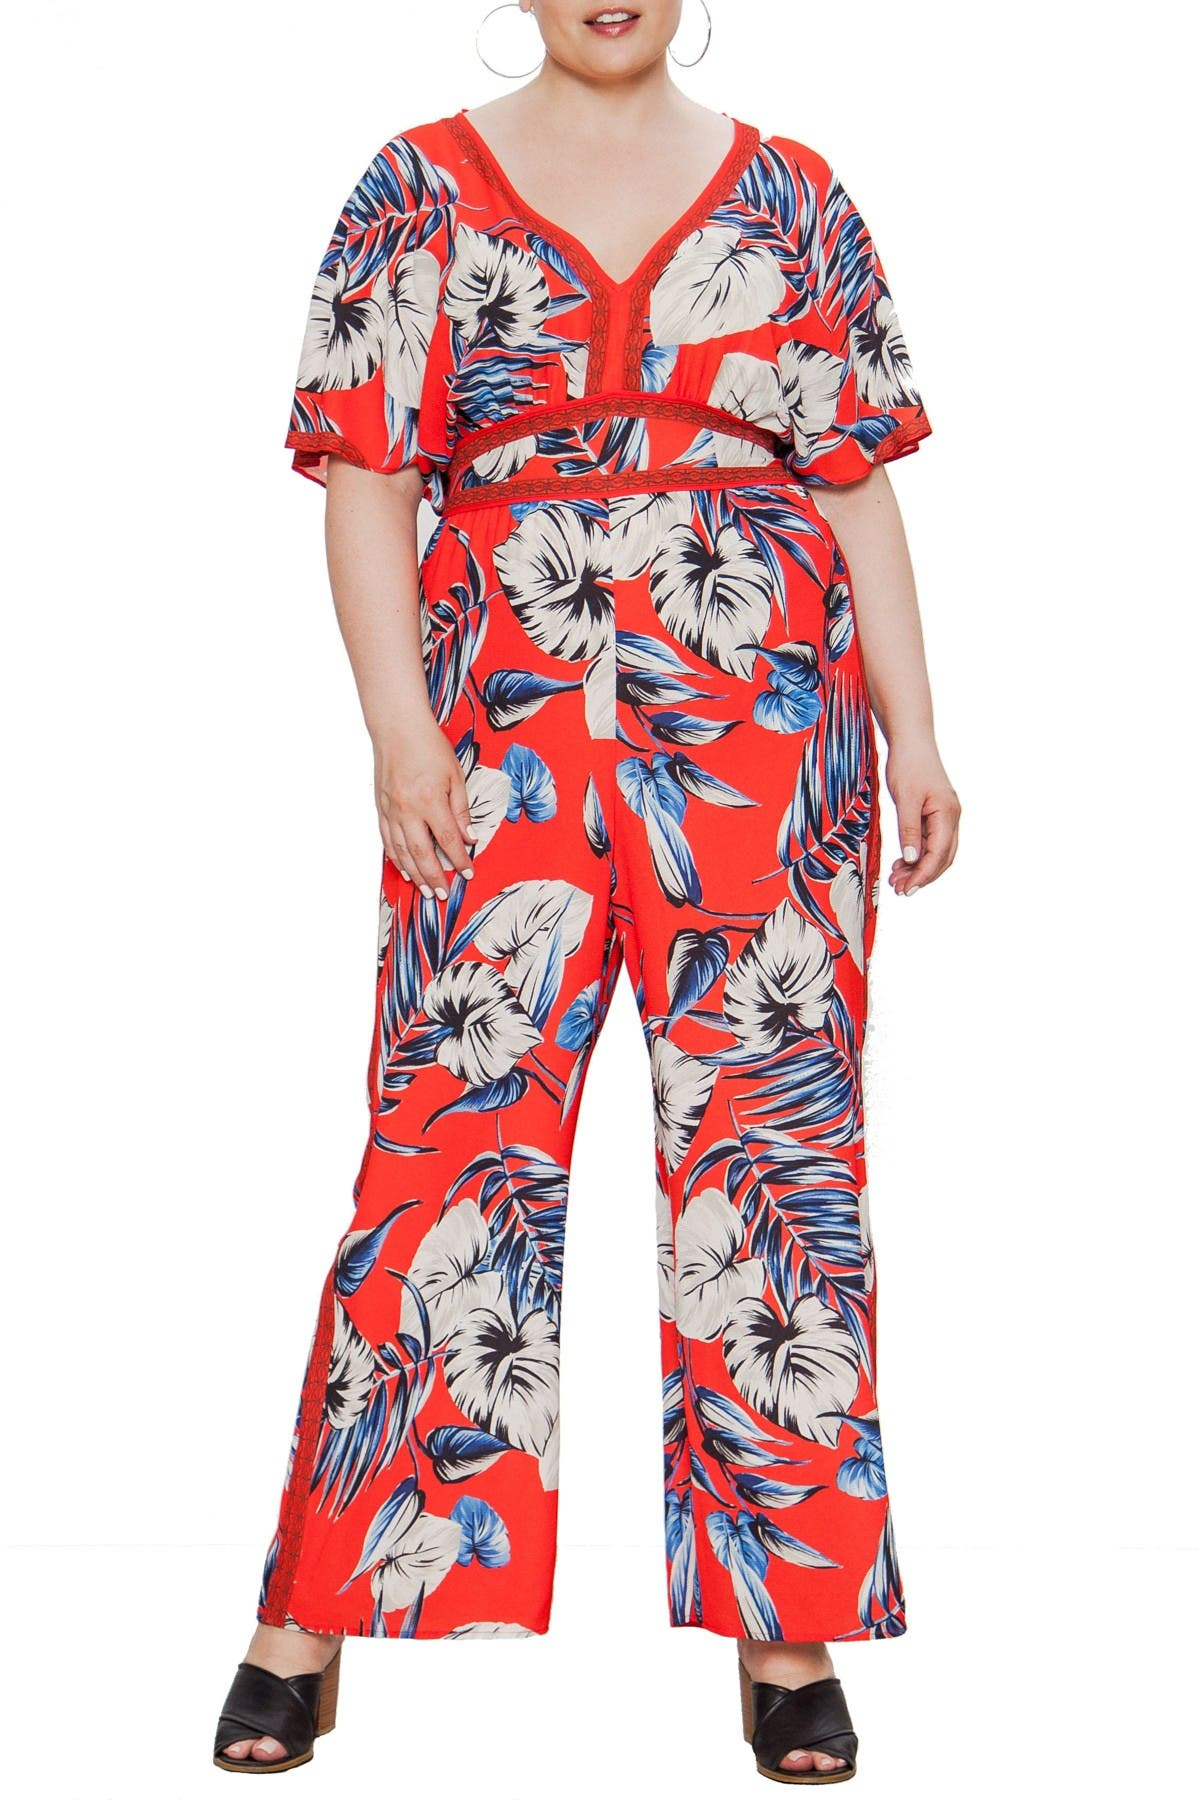 Image of Jealous Tomato Tropical Print Jumpsuit